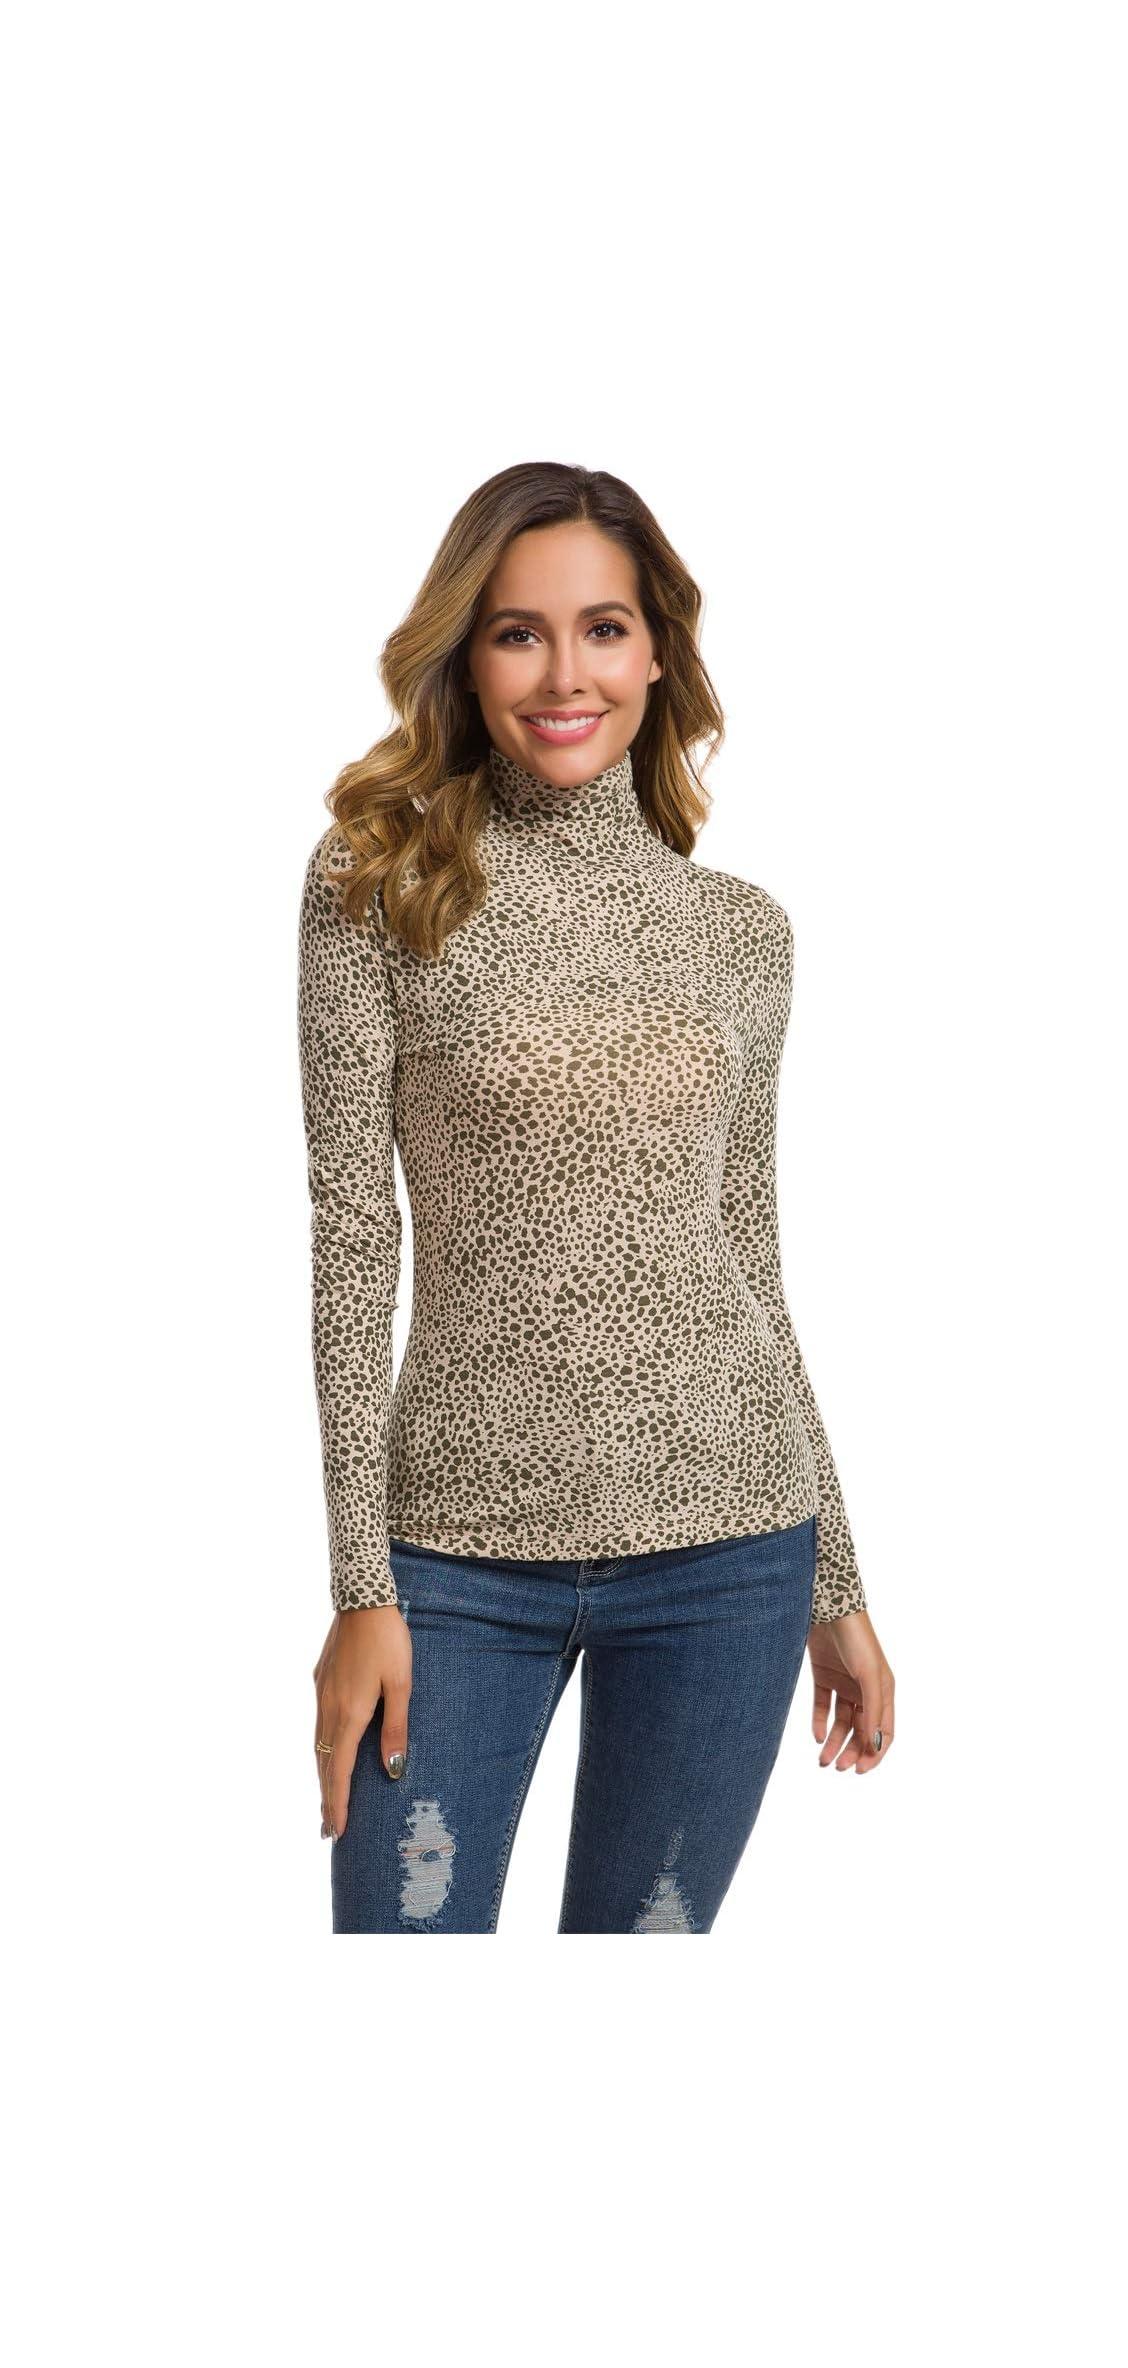 Women's Basic Long Sleeve Turtleneck T-shirt Slim Fit Pullover